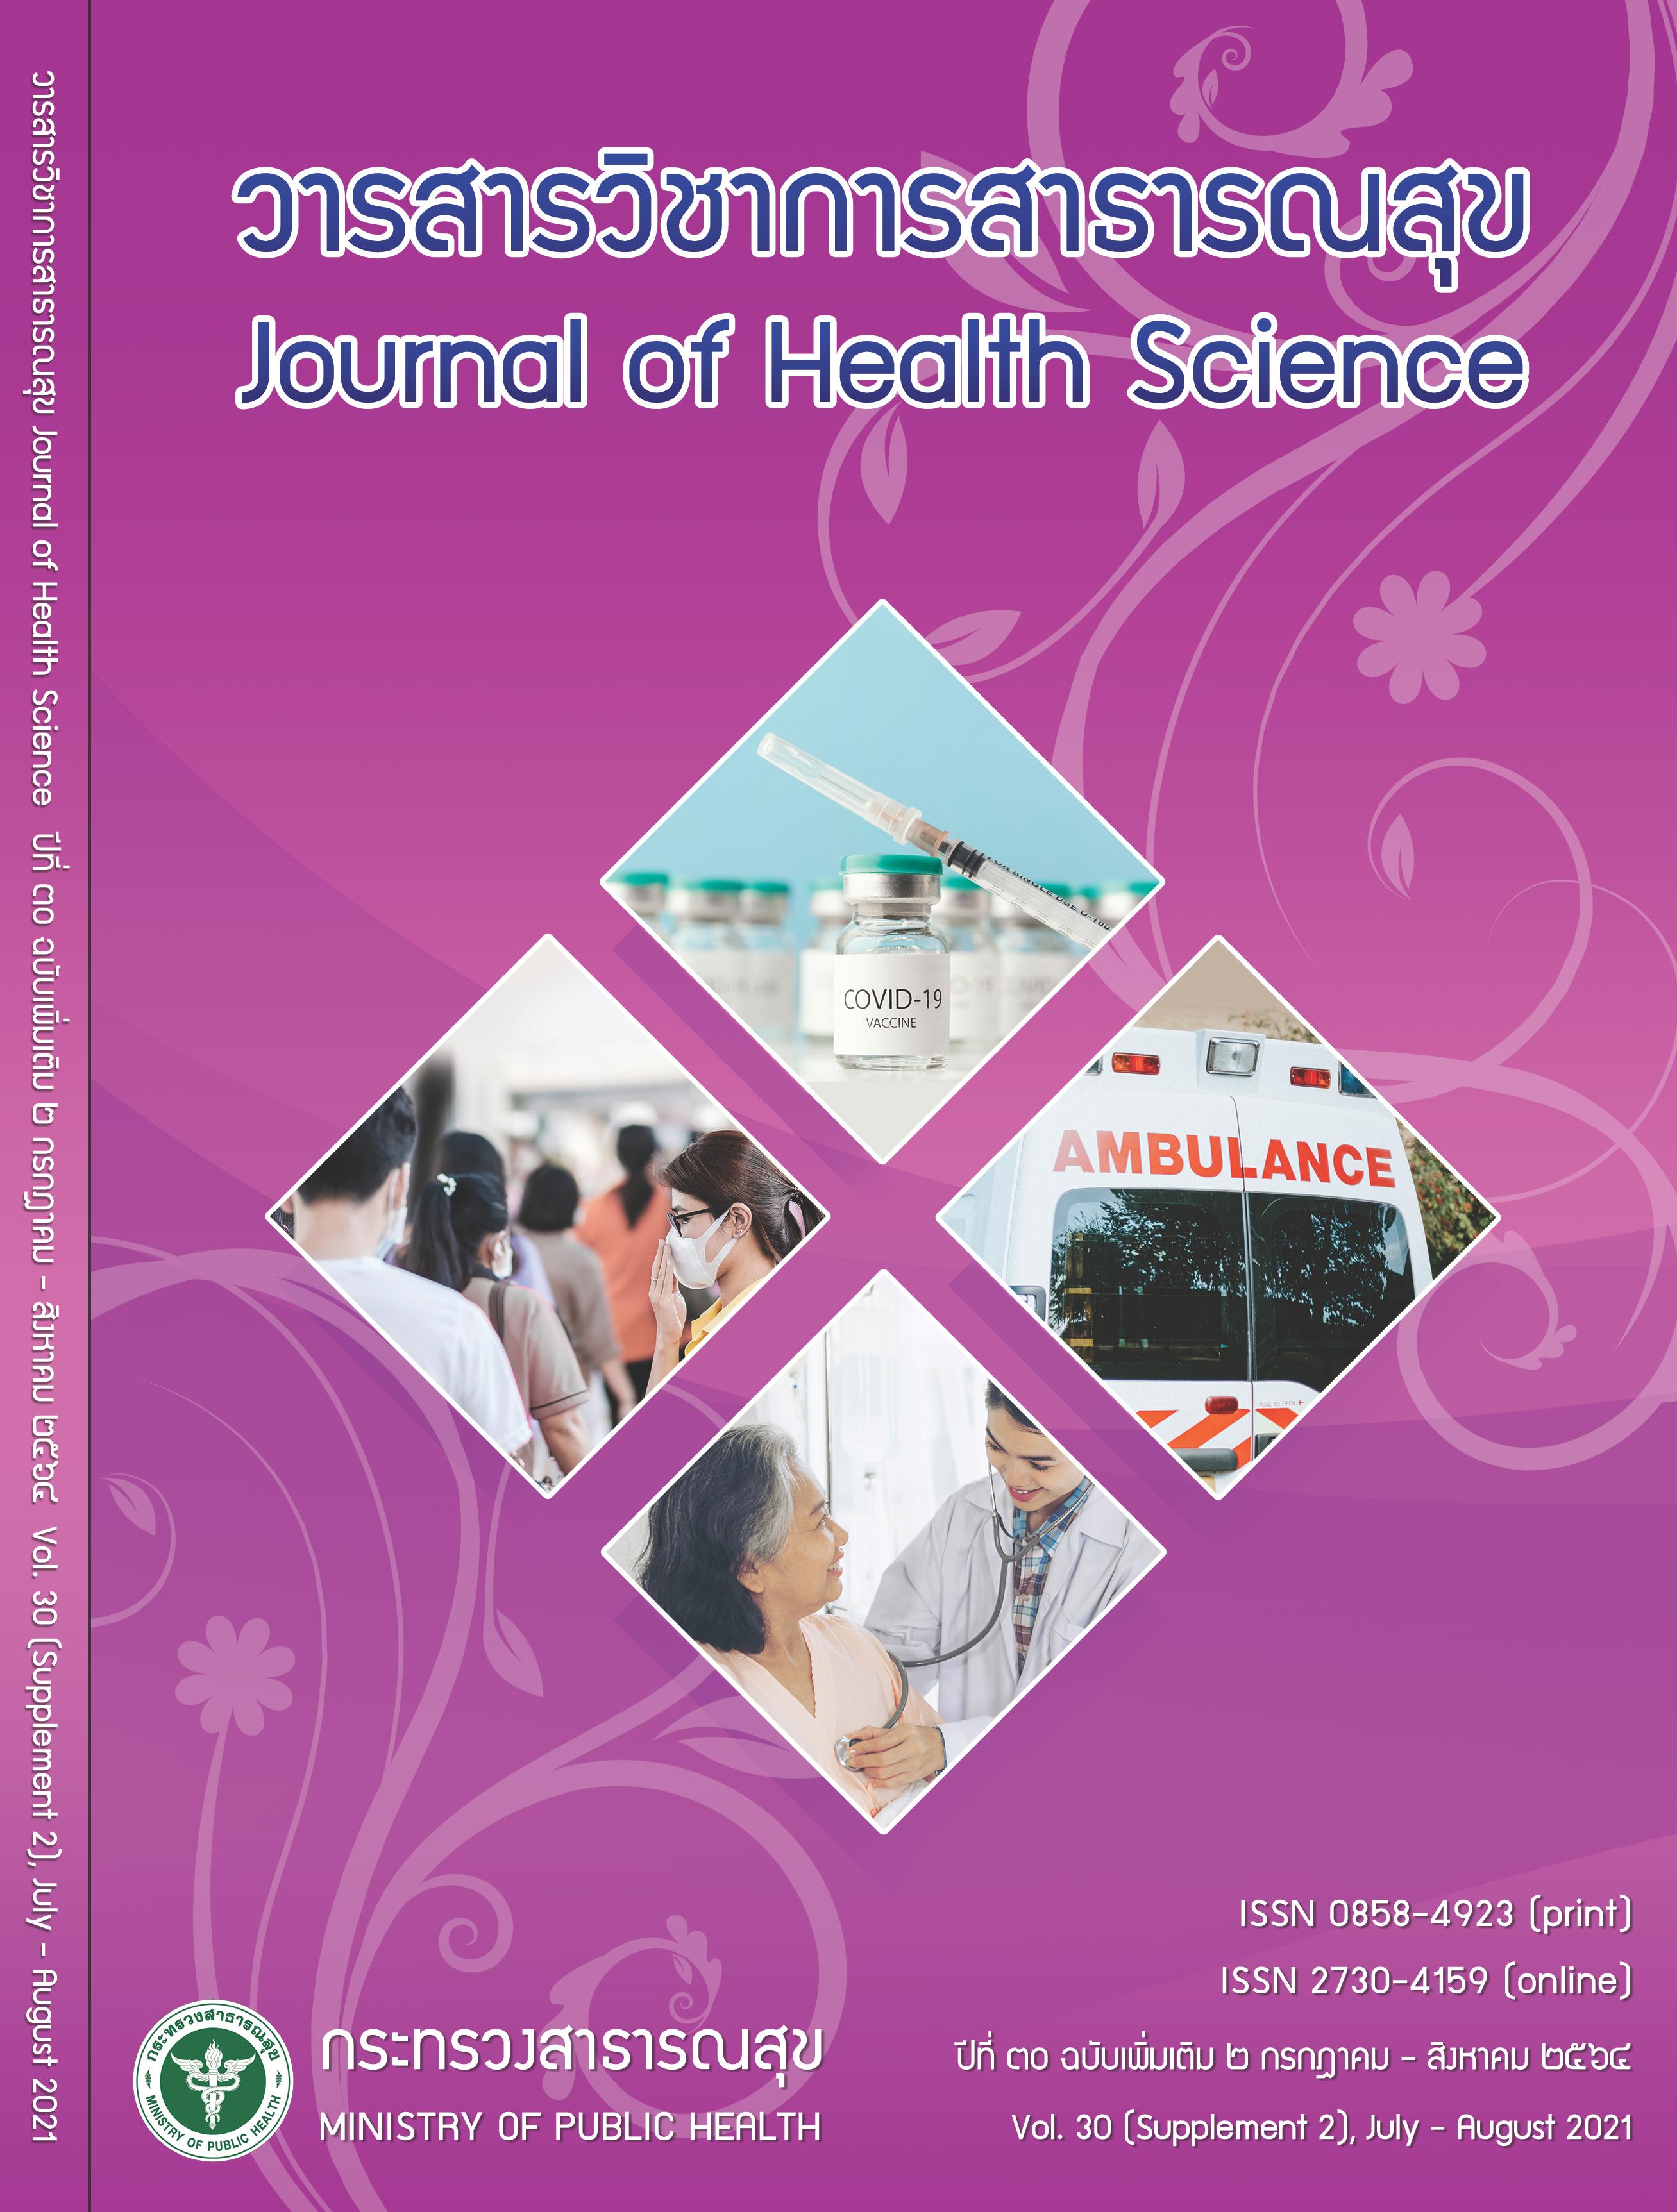 View Vol. 30 No. Supplement 2 (2021): Vol. 30 No. Supplement 2 : July-August 2021